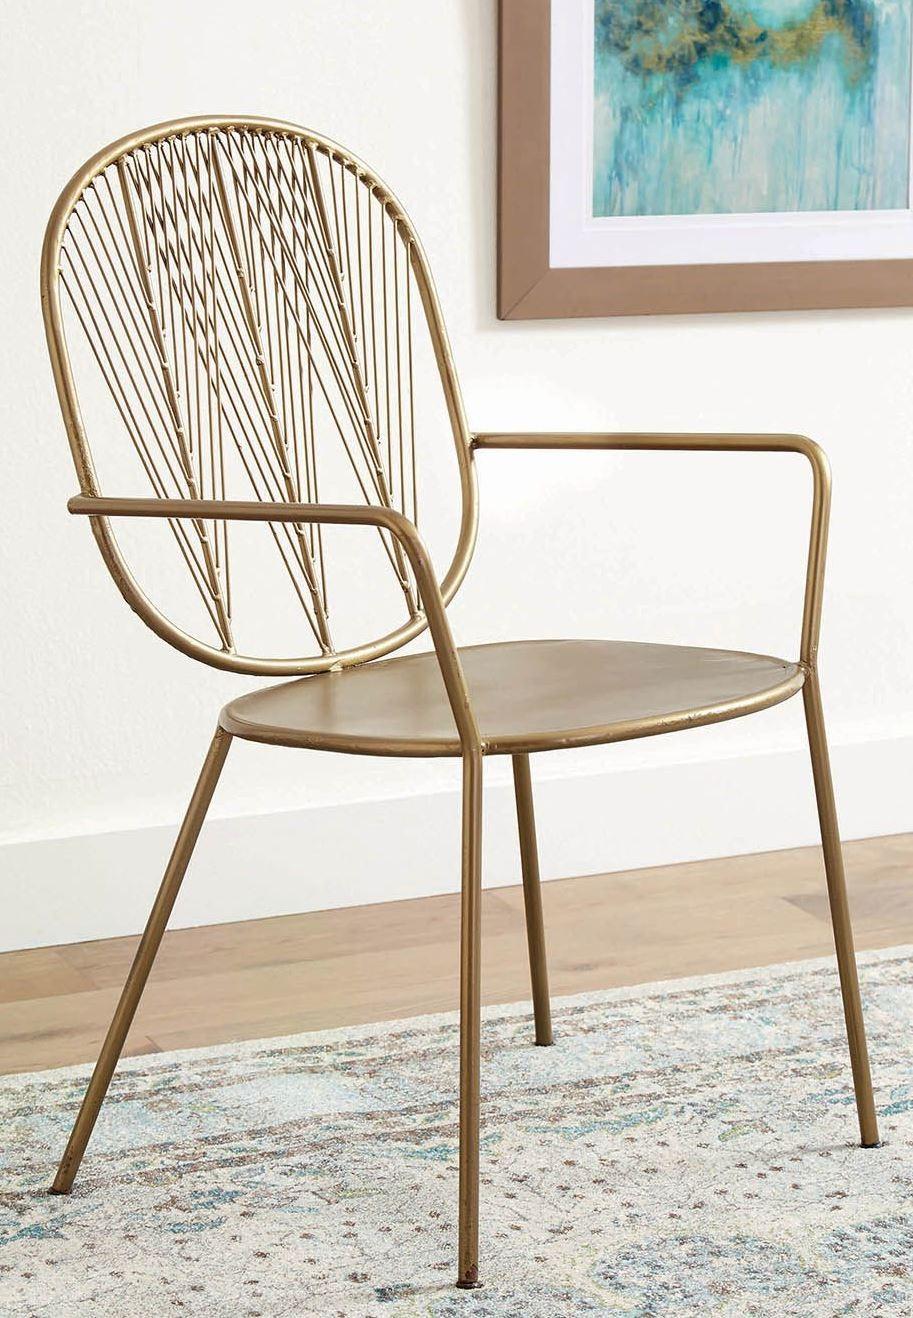 Awe Inspiring Brass Metal Accent Chair Set Of 2 Andrewgaddart Wooden Chair Designs For Living Room Andrewgaddartcom